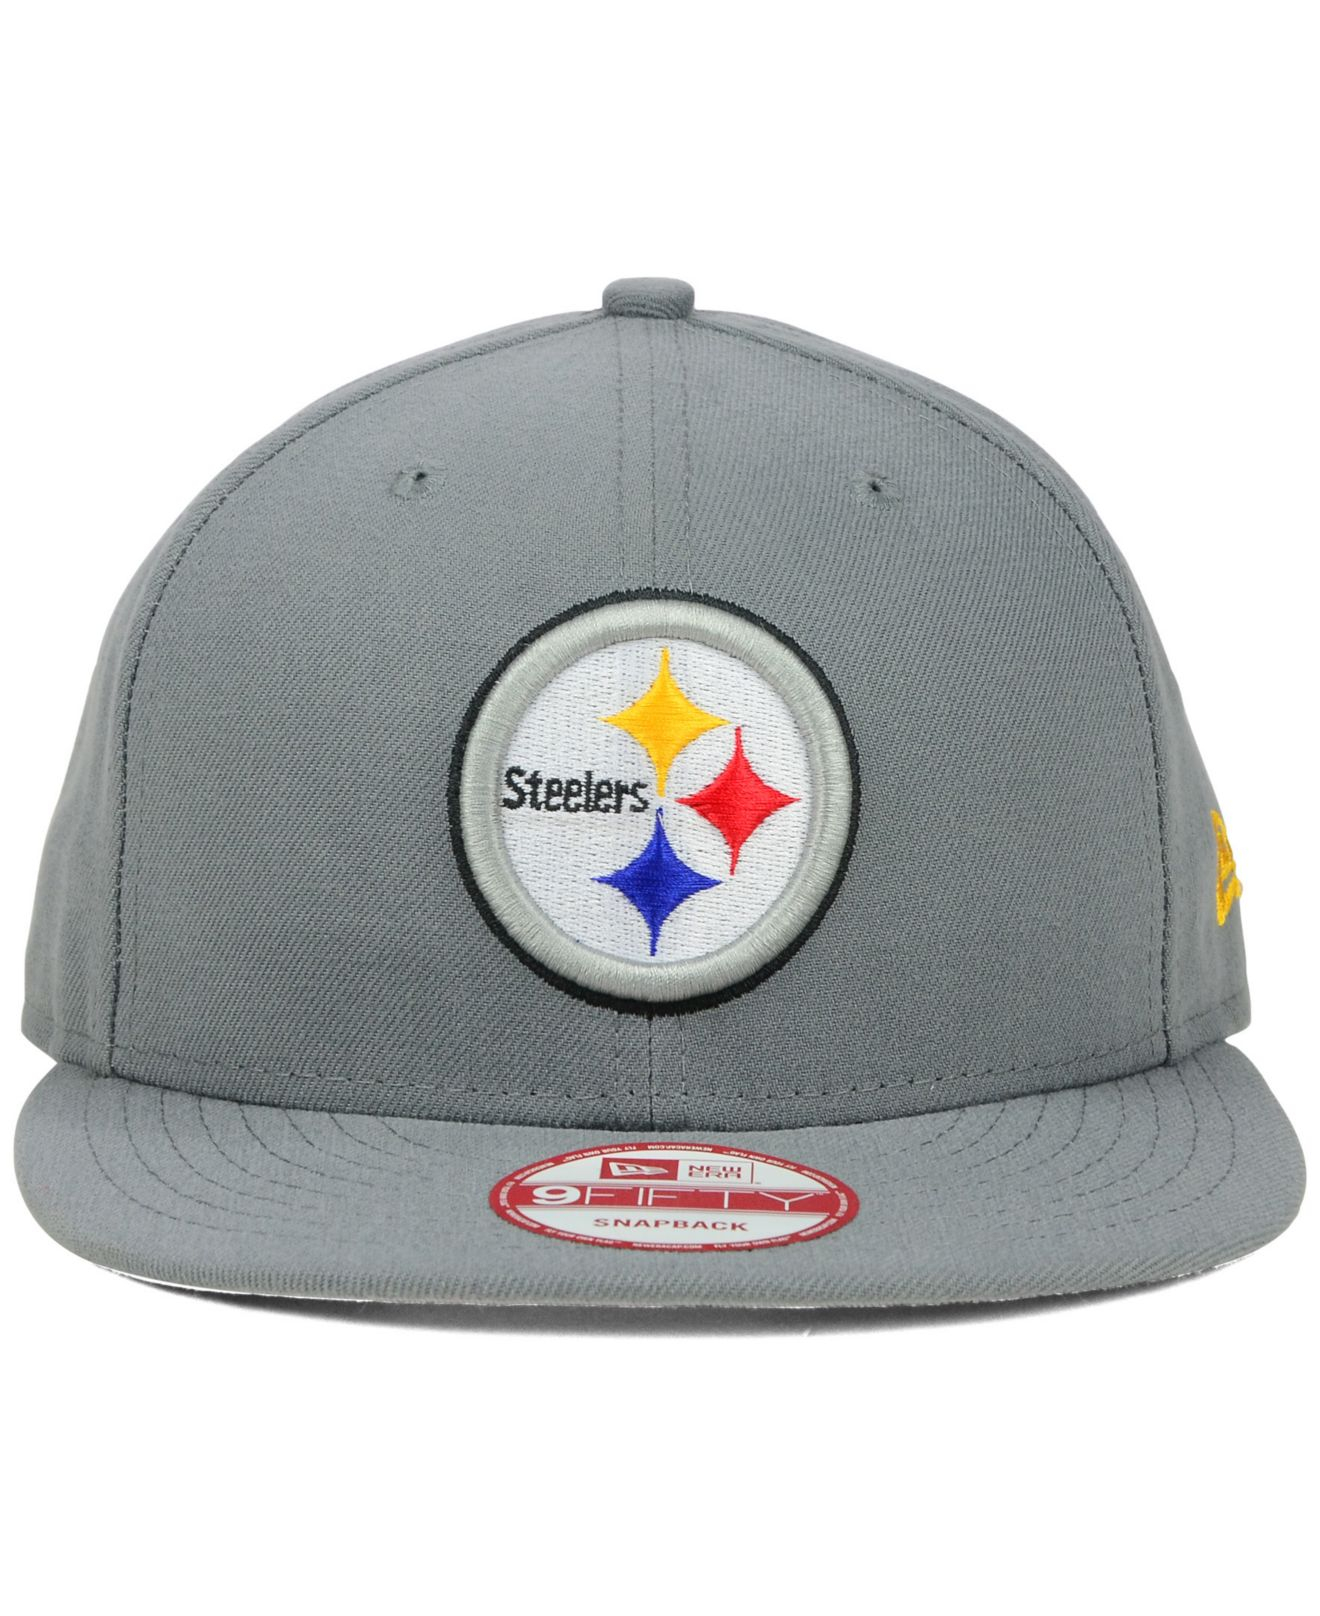 5f50132b26b Lyst - KTZ Pittsburgh Steelers Storm 9Fifty Snapback Cap in Gray for Men